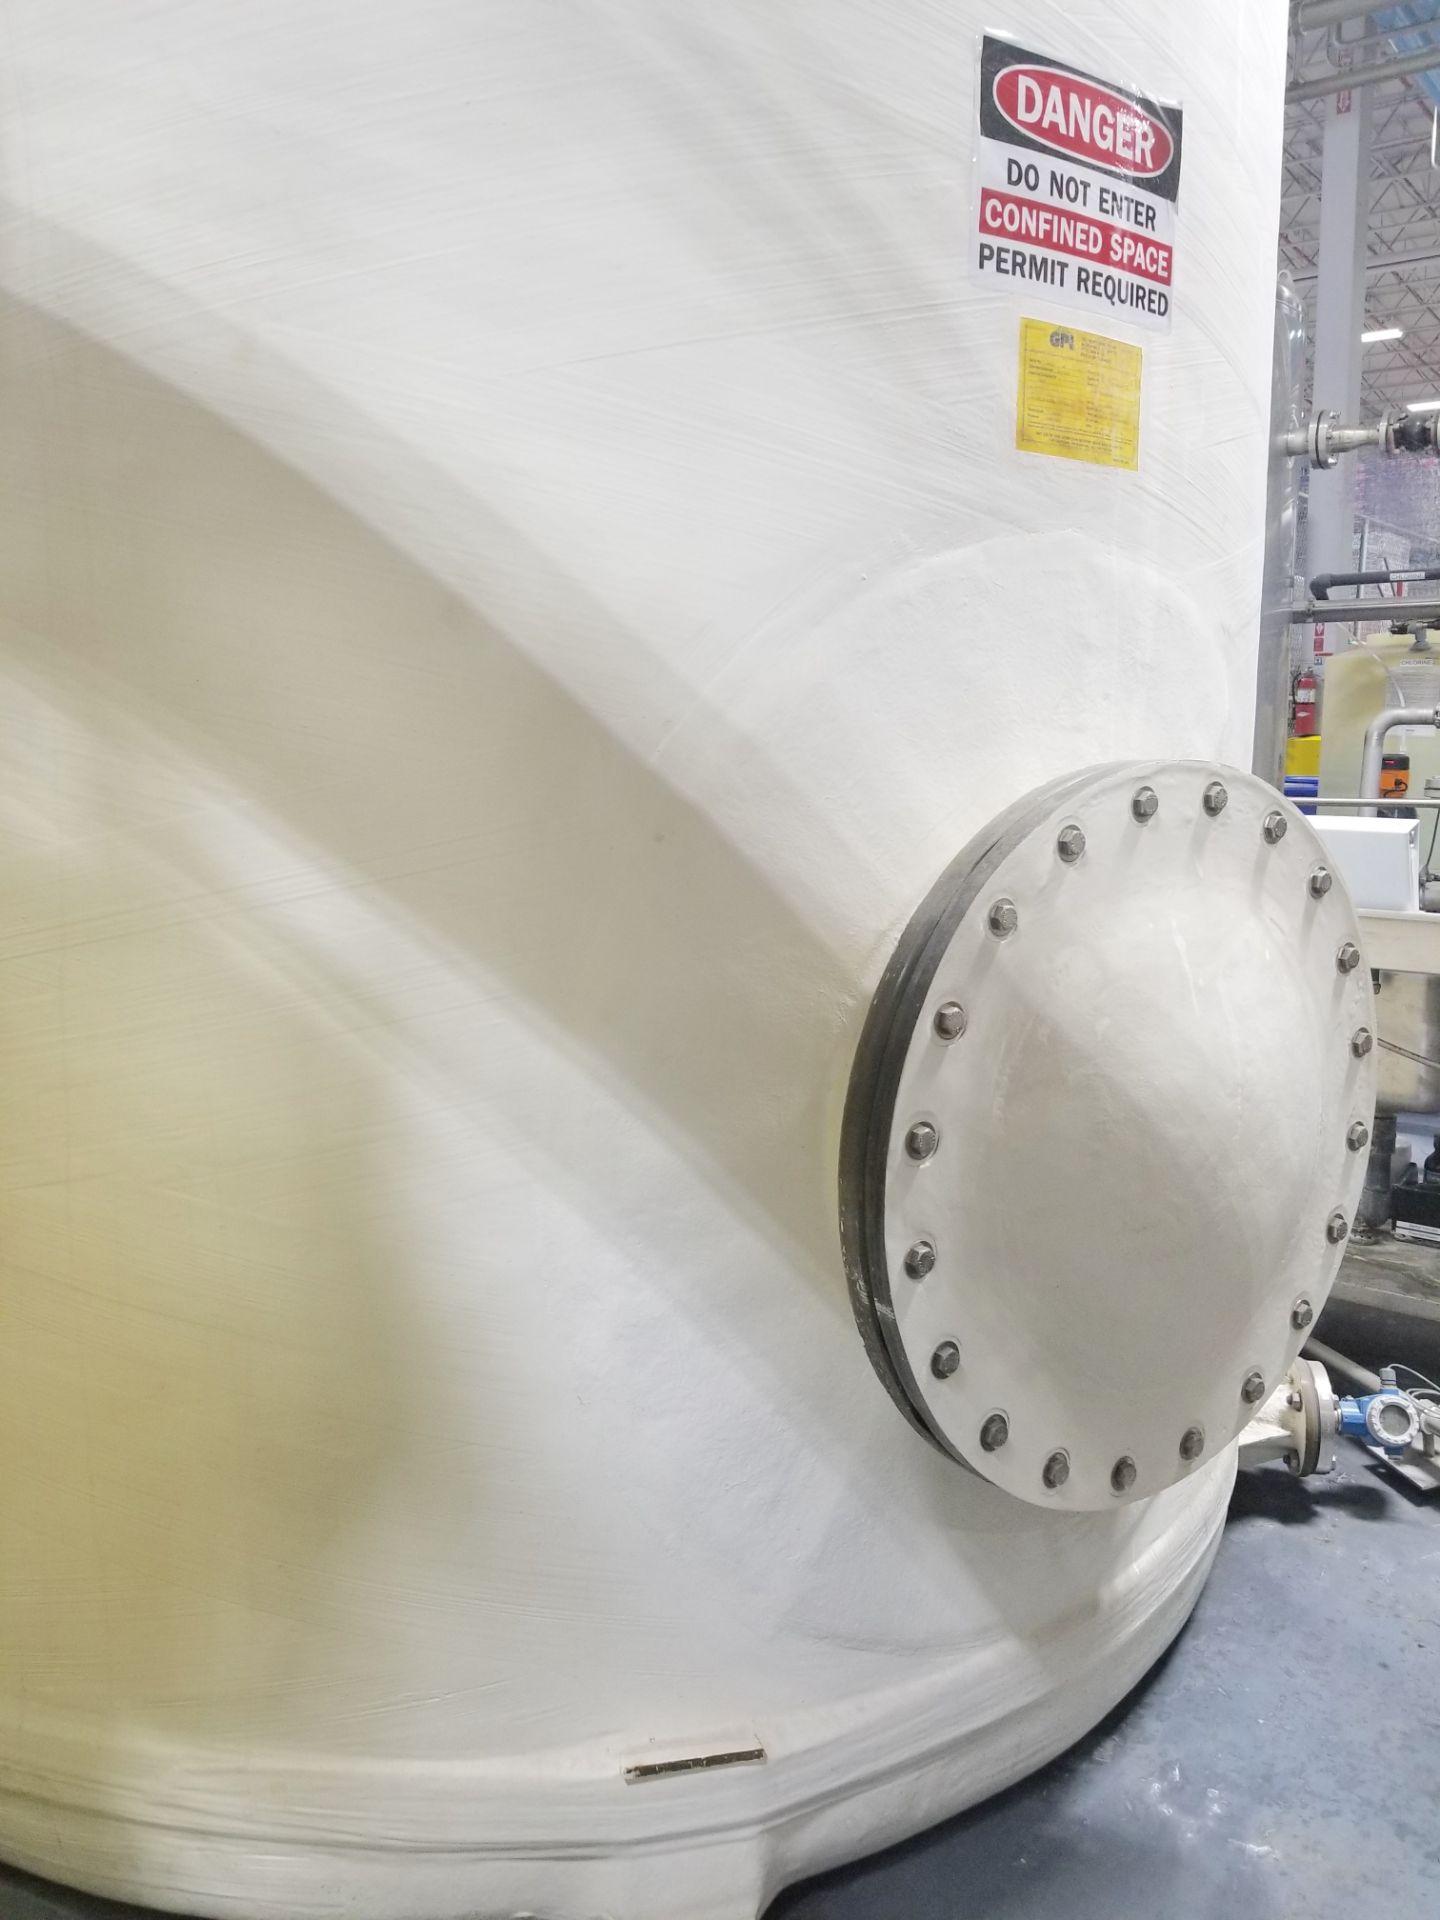 2010 GPI Corp 5000 Gallon Fiberglass Tank - Image 4 of 5